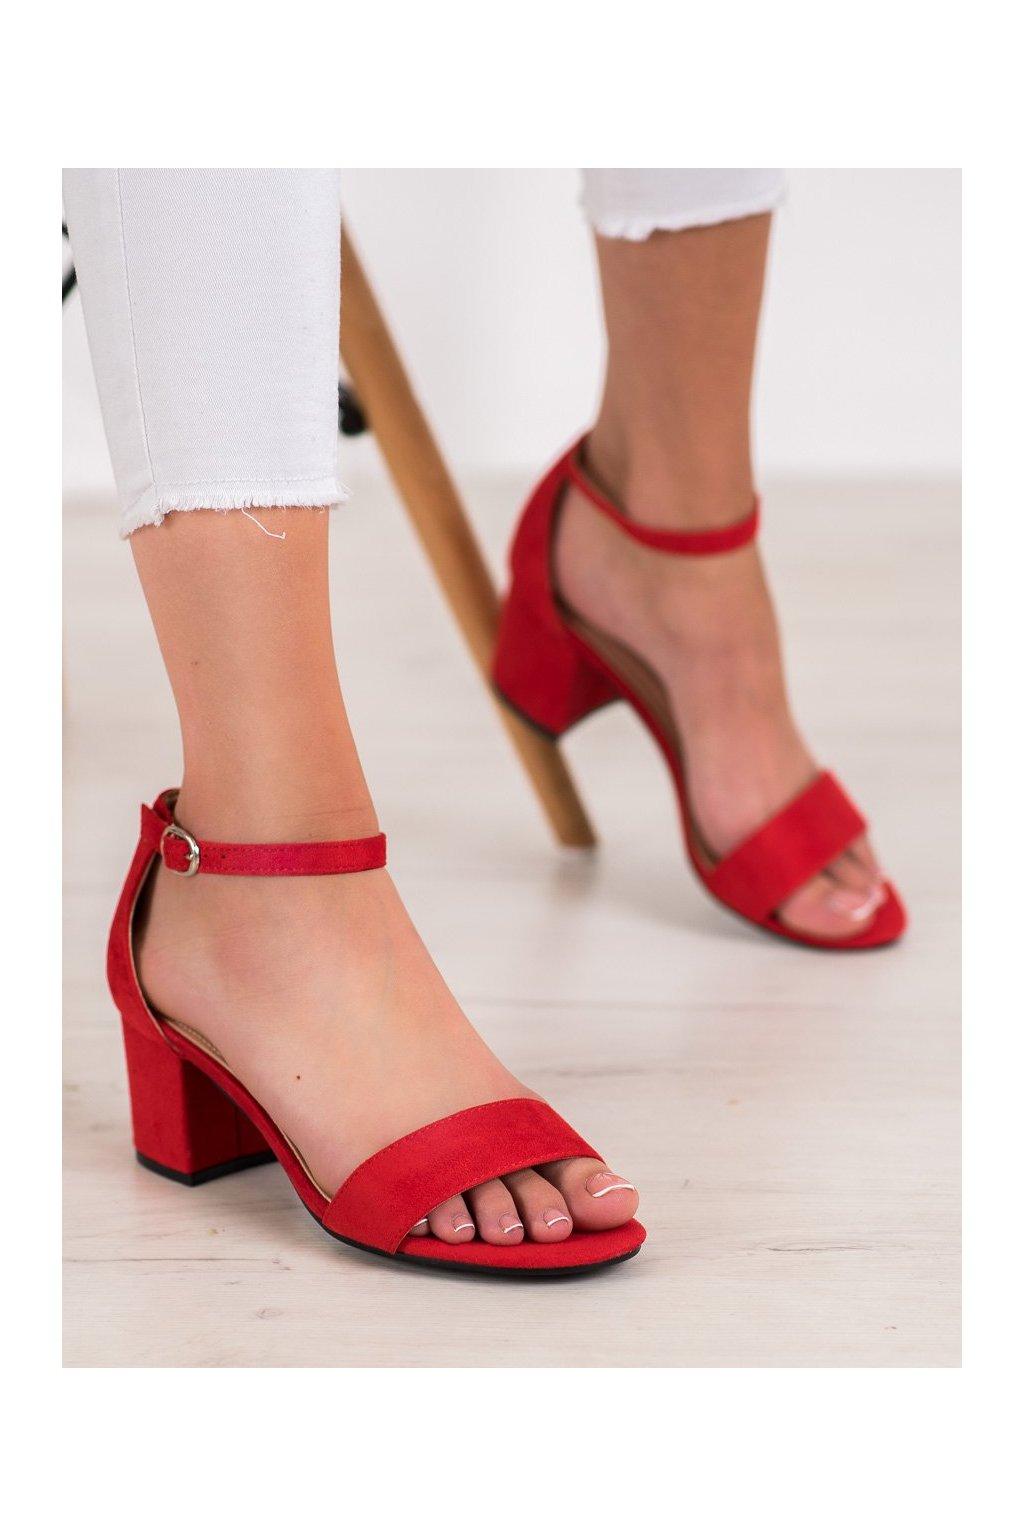 Červené sandále Diamantique kod 1170-13R